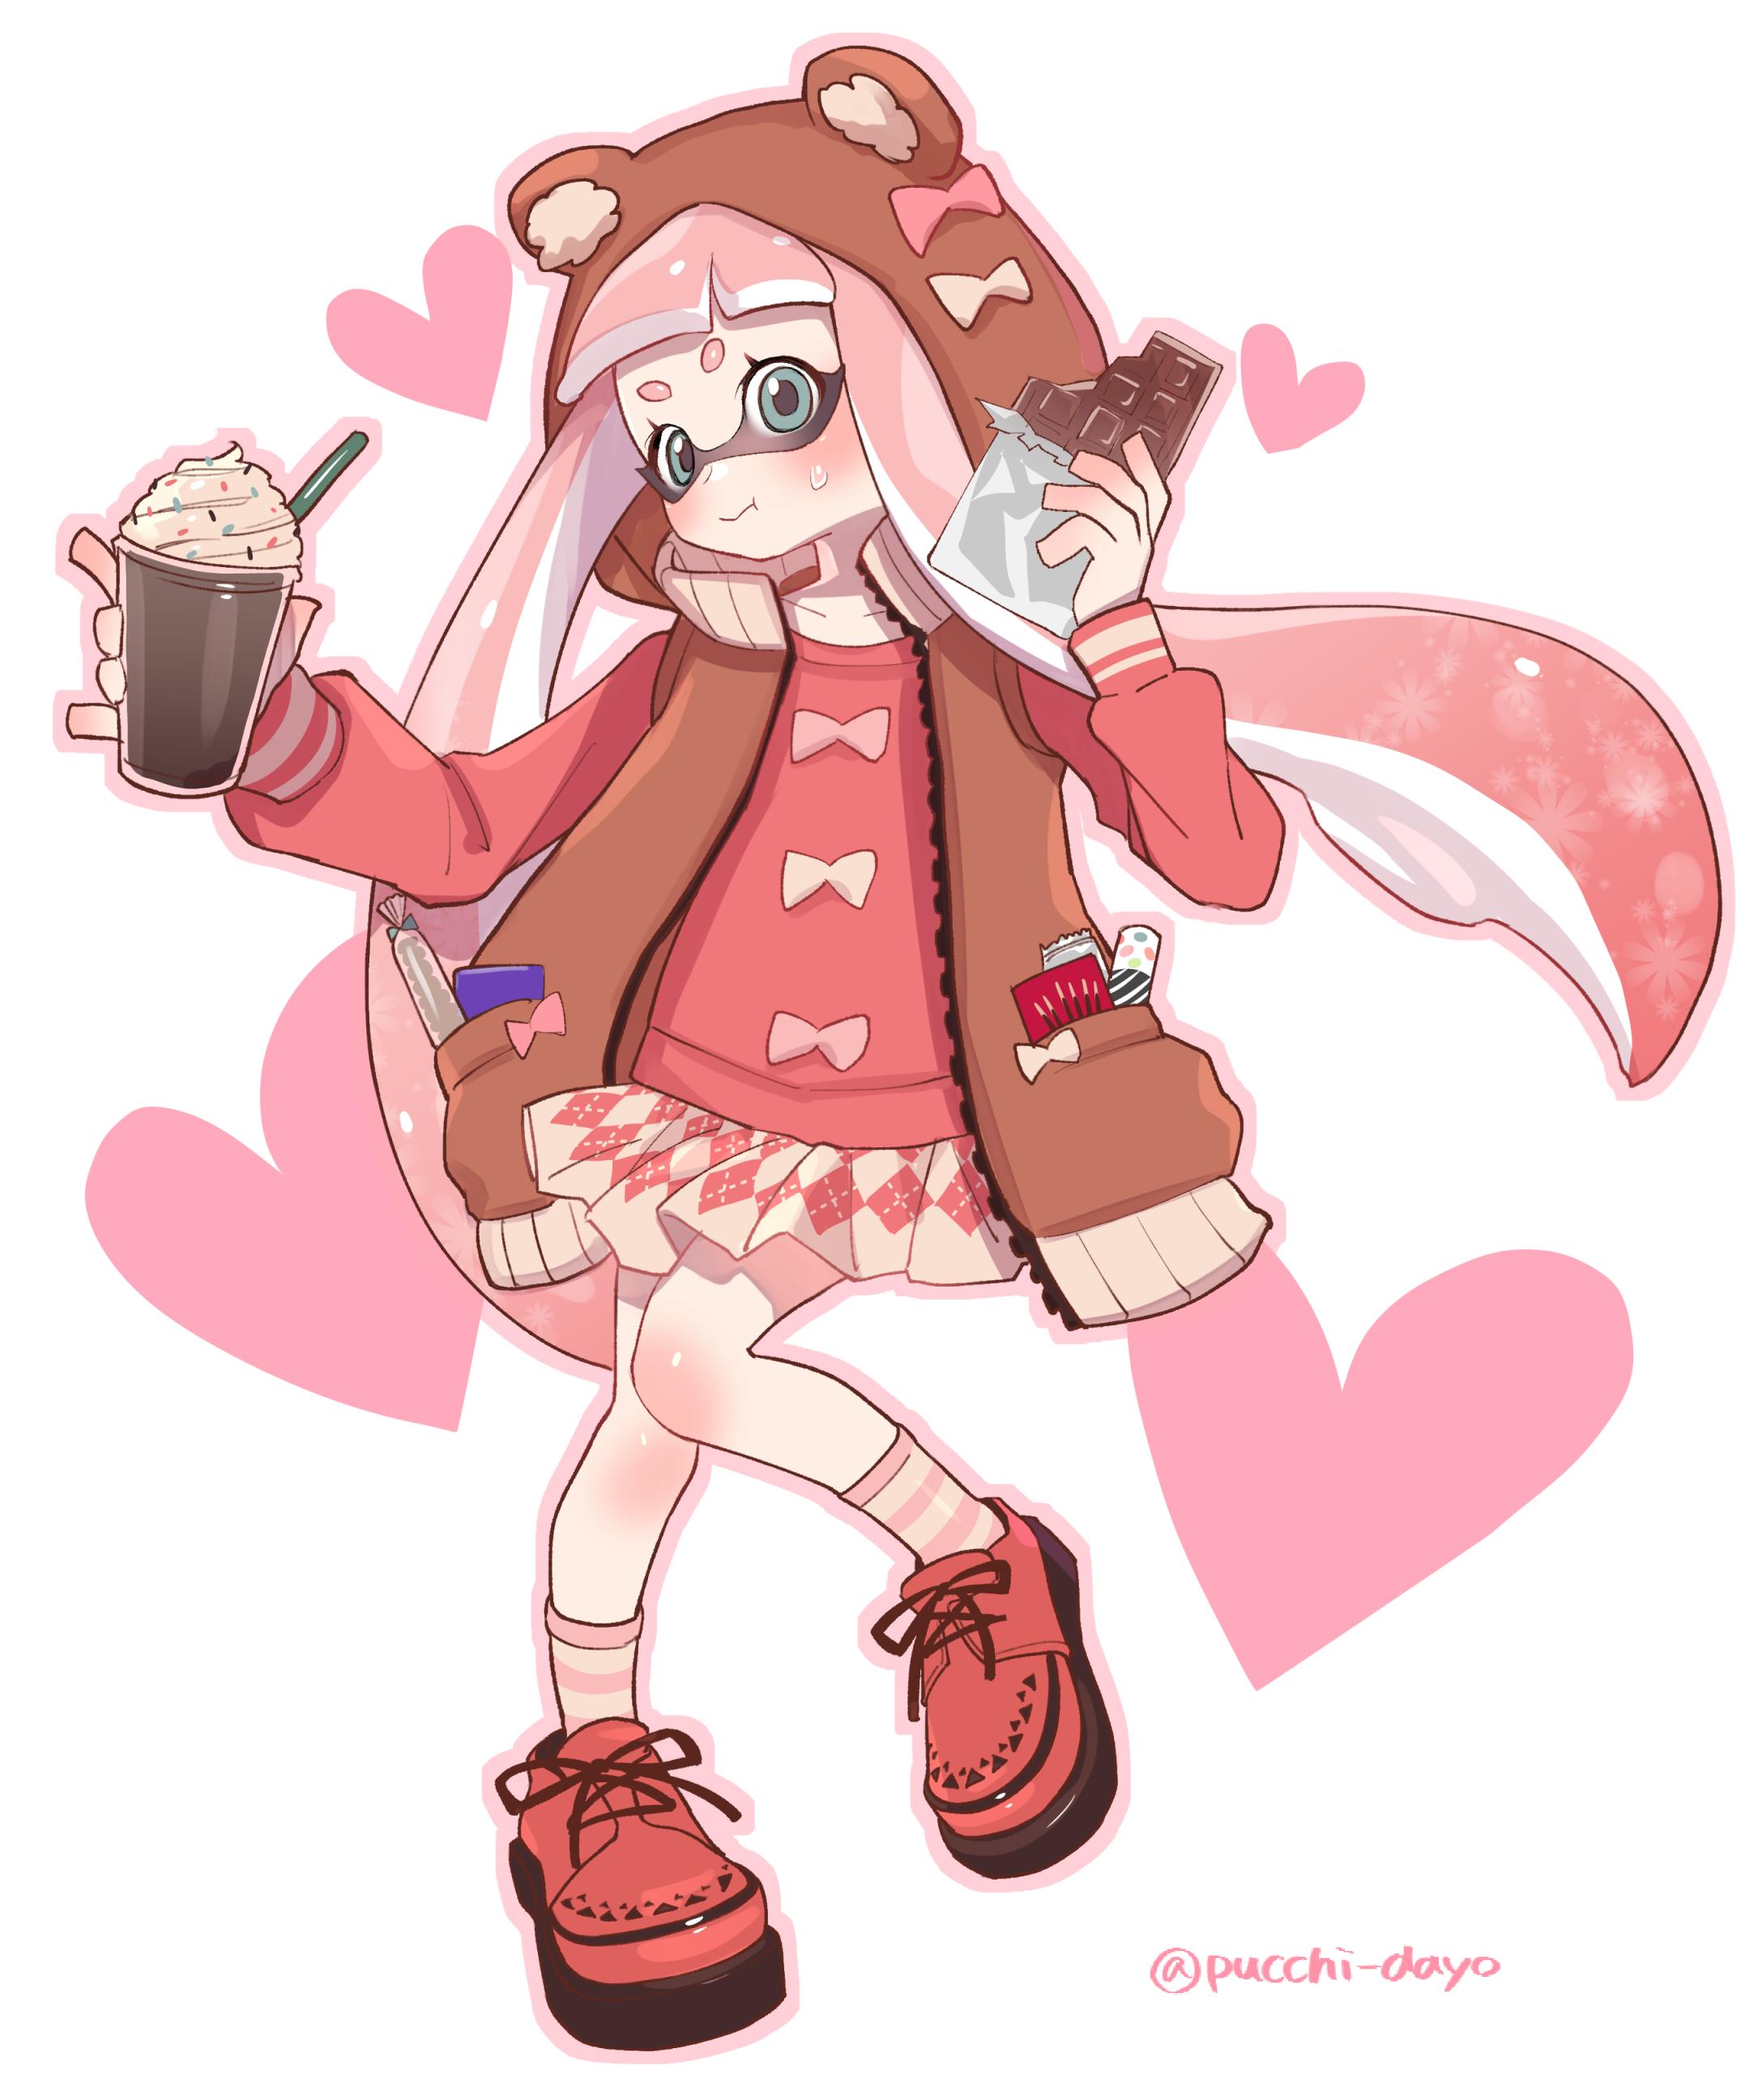 Inkling Splatoon Image 2121245 Zerochan Anime Image Board